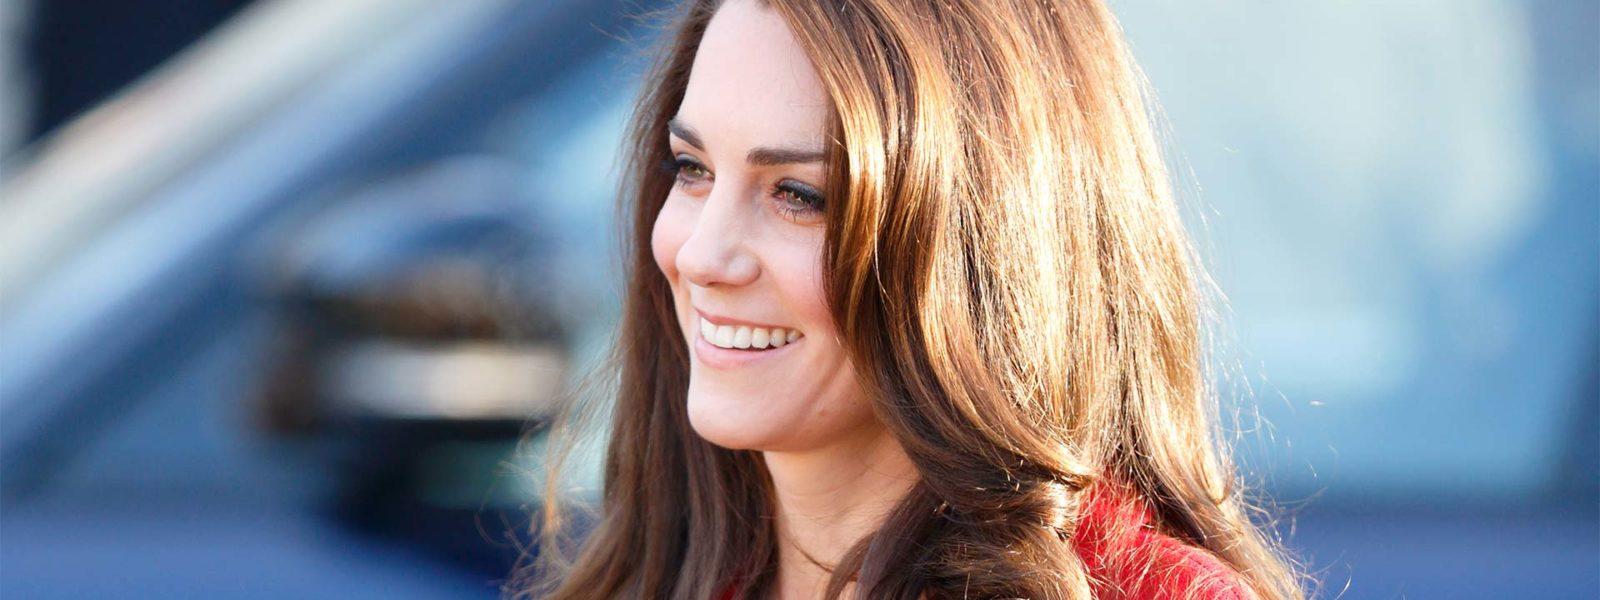 BBCA_RoyalDocs_Kate-The-Making-of-a-Modern-Queen